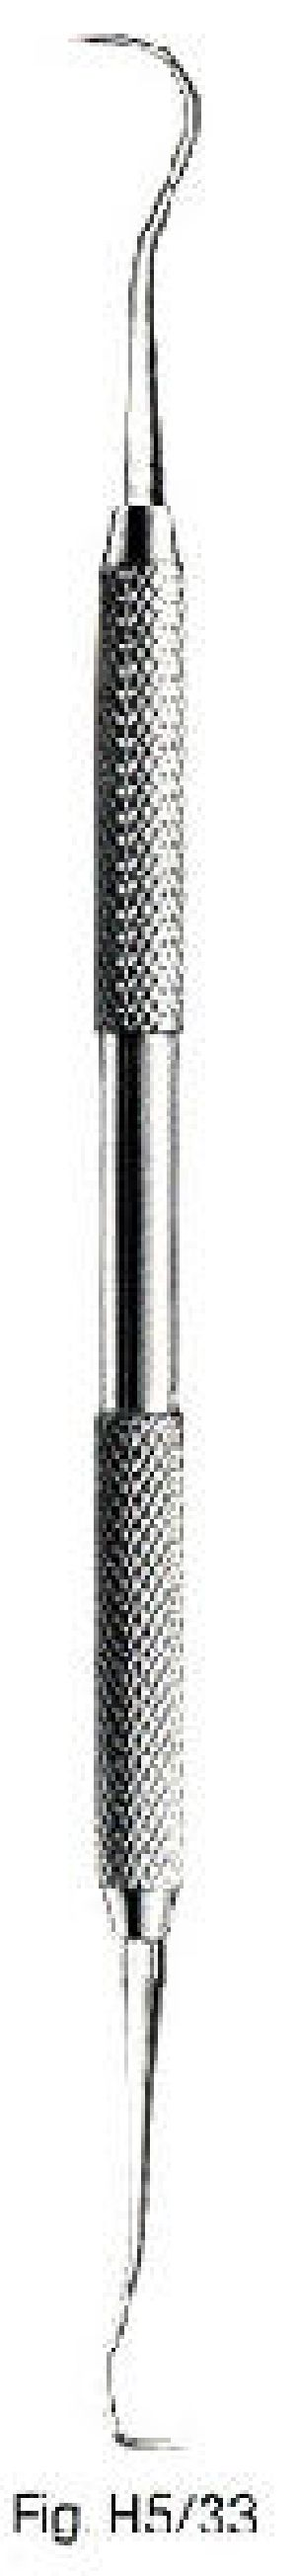 MI-72-107 Dental Scaler